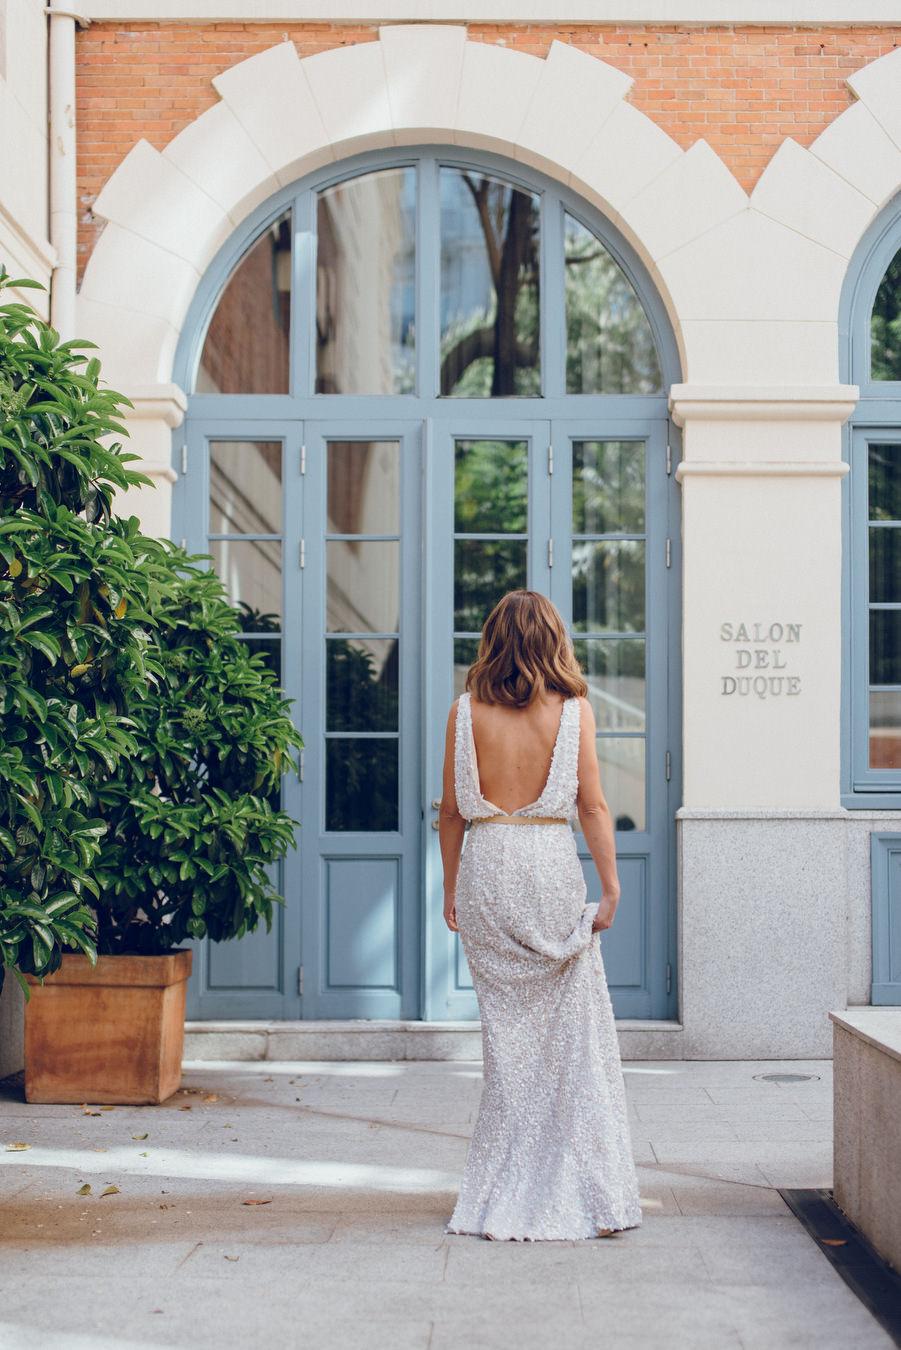 calista-one-lista-de-bodas-online-blog-de-bodas-bossanova-looks-invitadas-pepe-botella-1